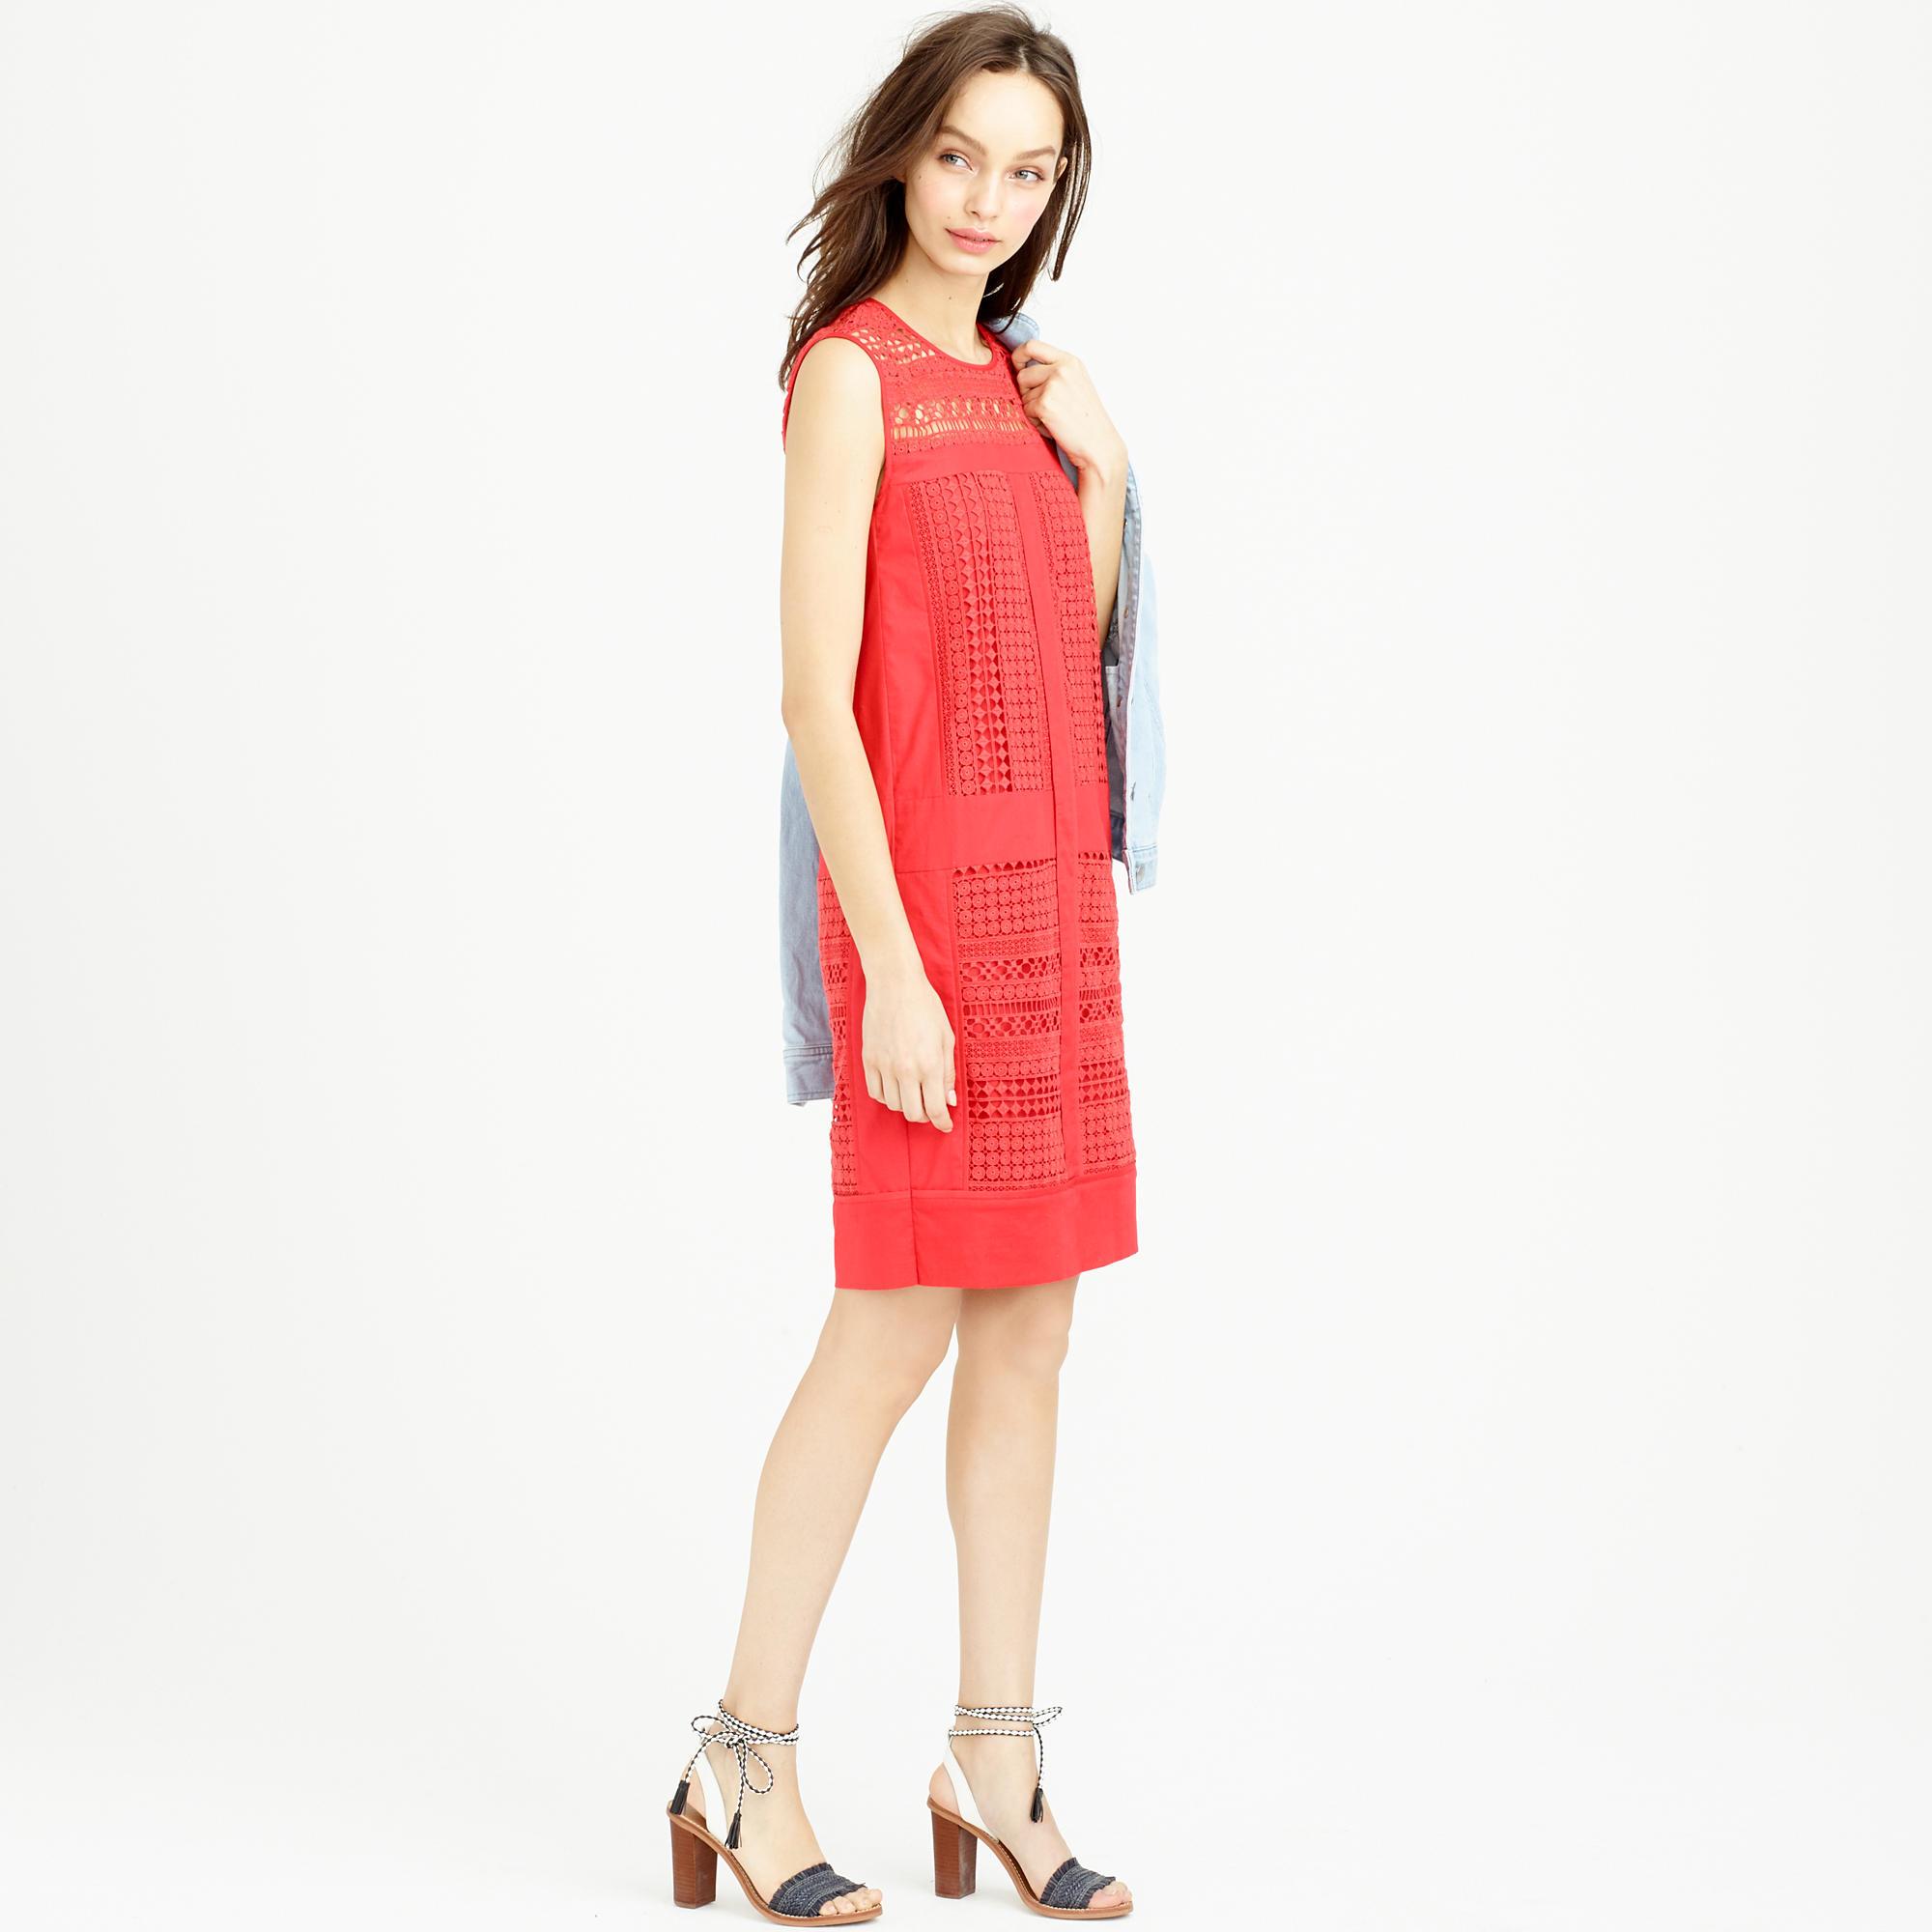 J crew red lace dress | Style lace dress